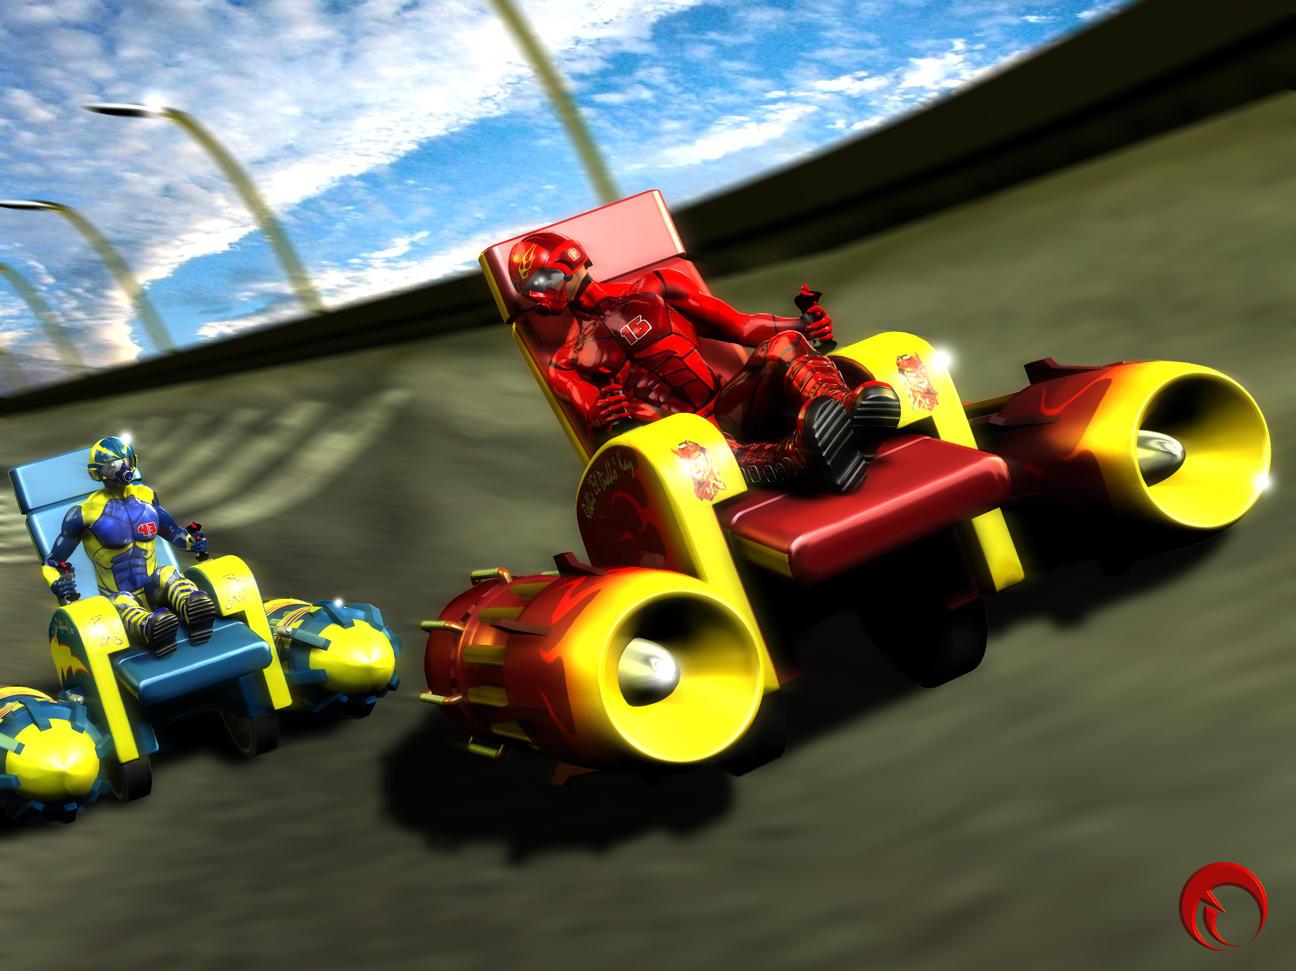 Olympic Recliner Races / Heromorph Challenge #4